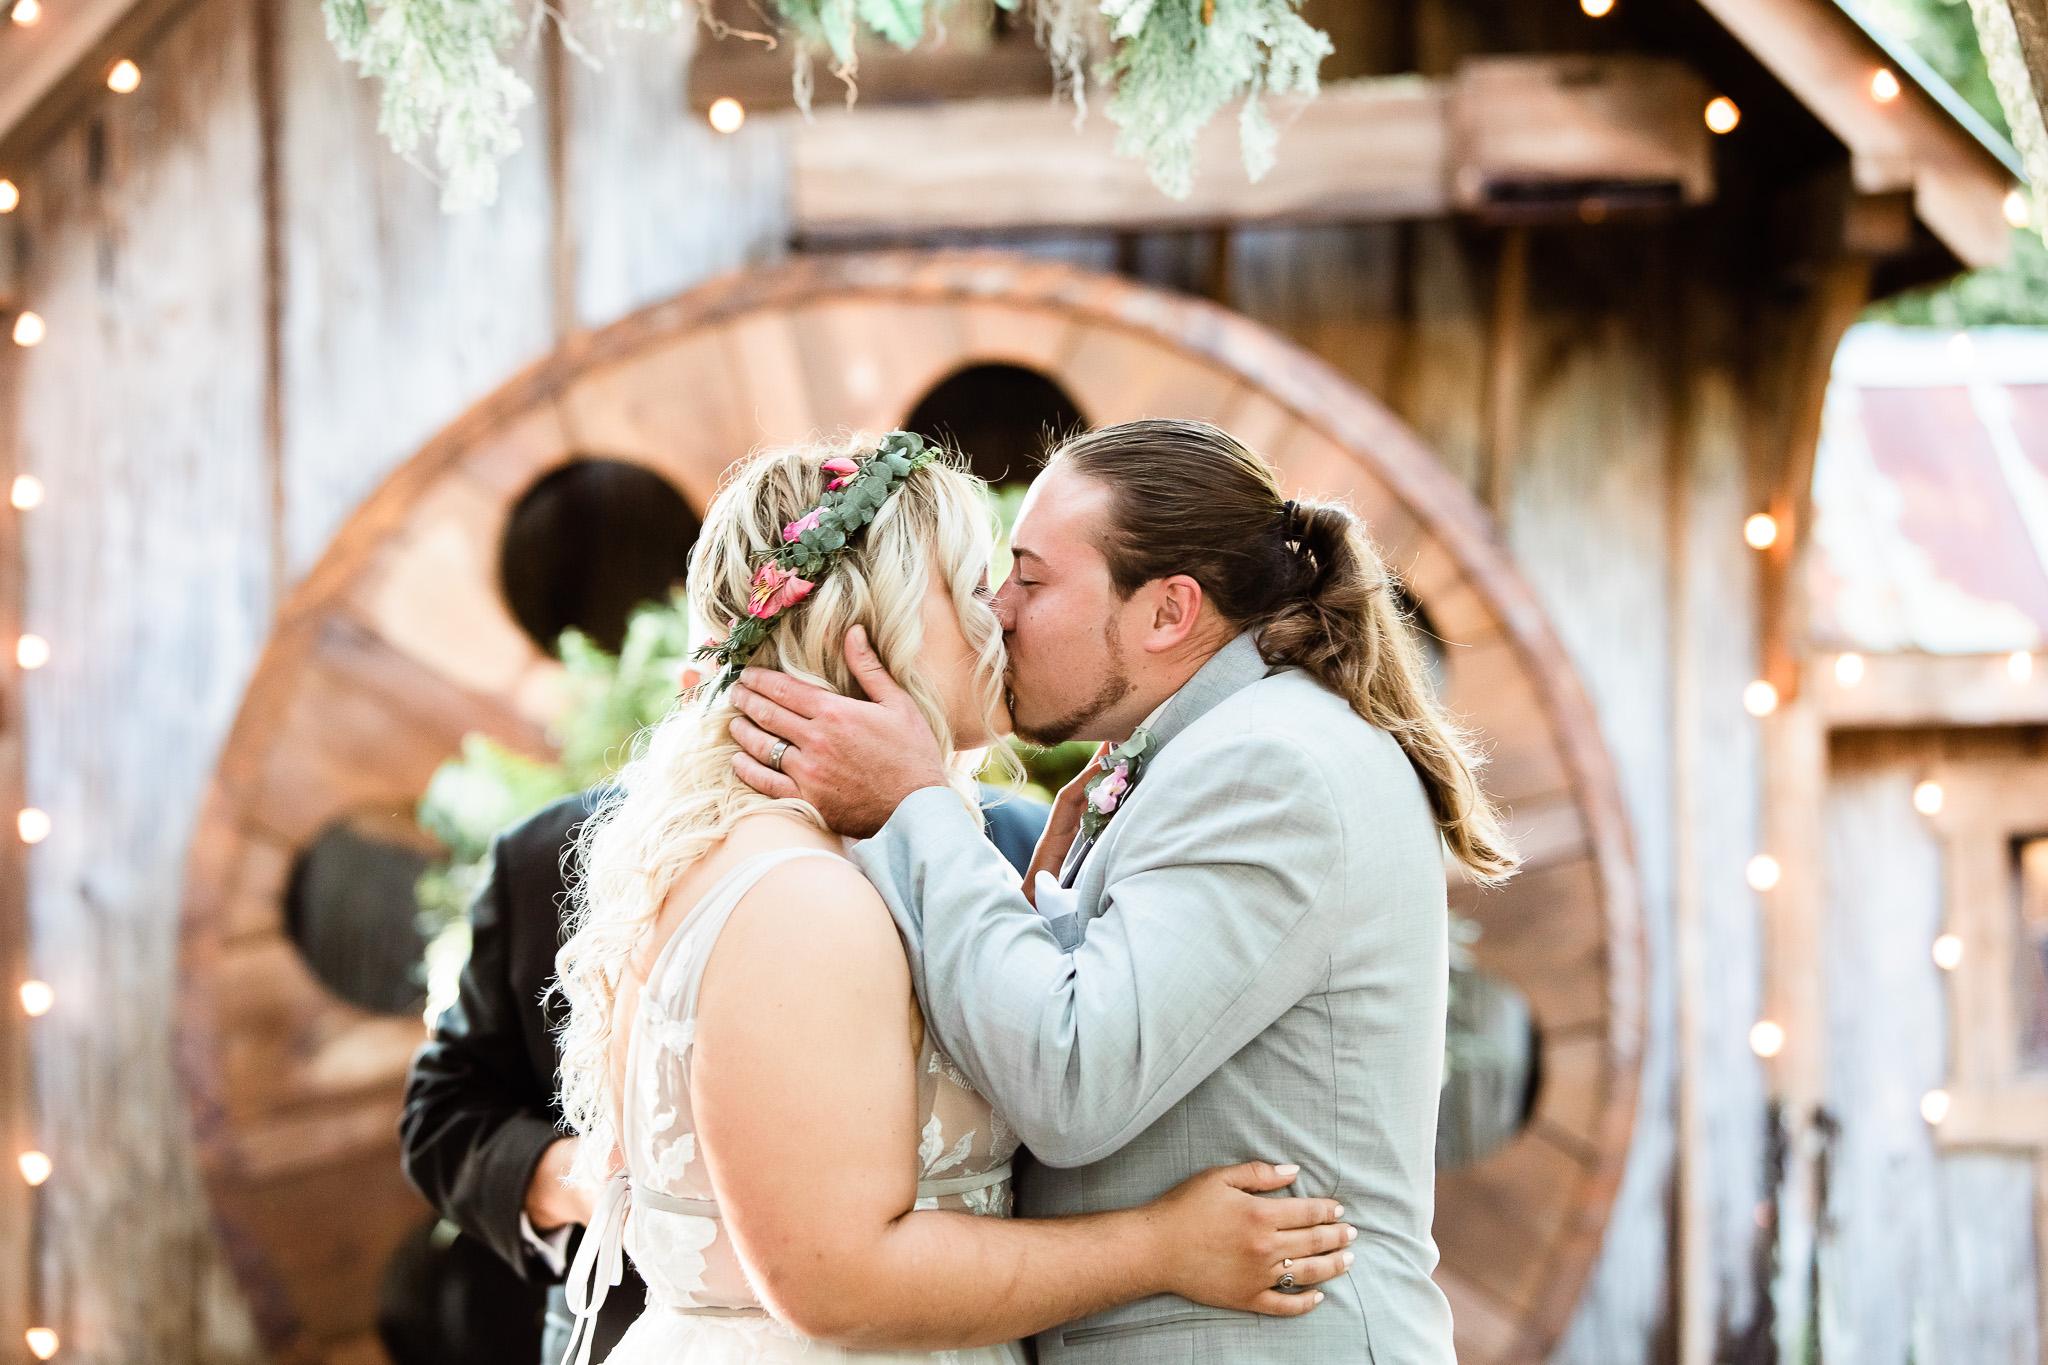 TAMPA_WEDDING_GIGIS_COUNTRY_GARDEN_CJMZ_TJL48266.jpg